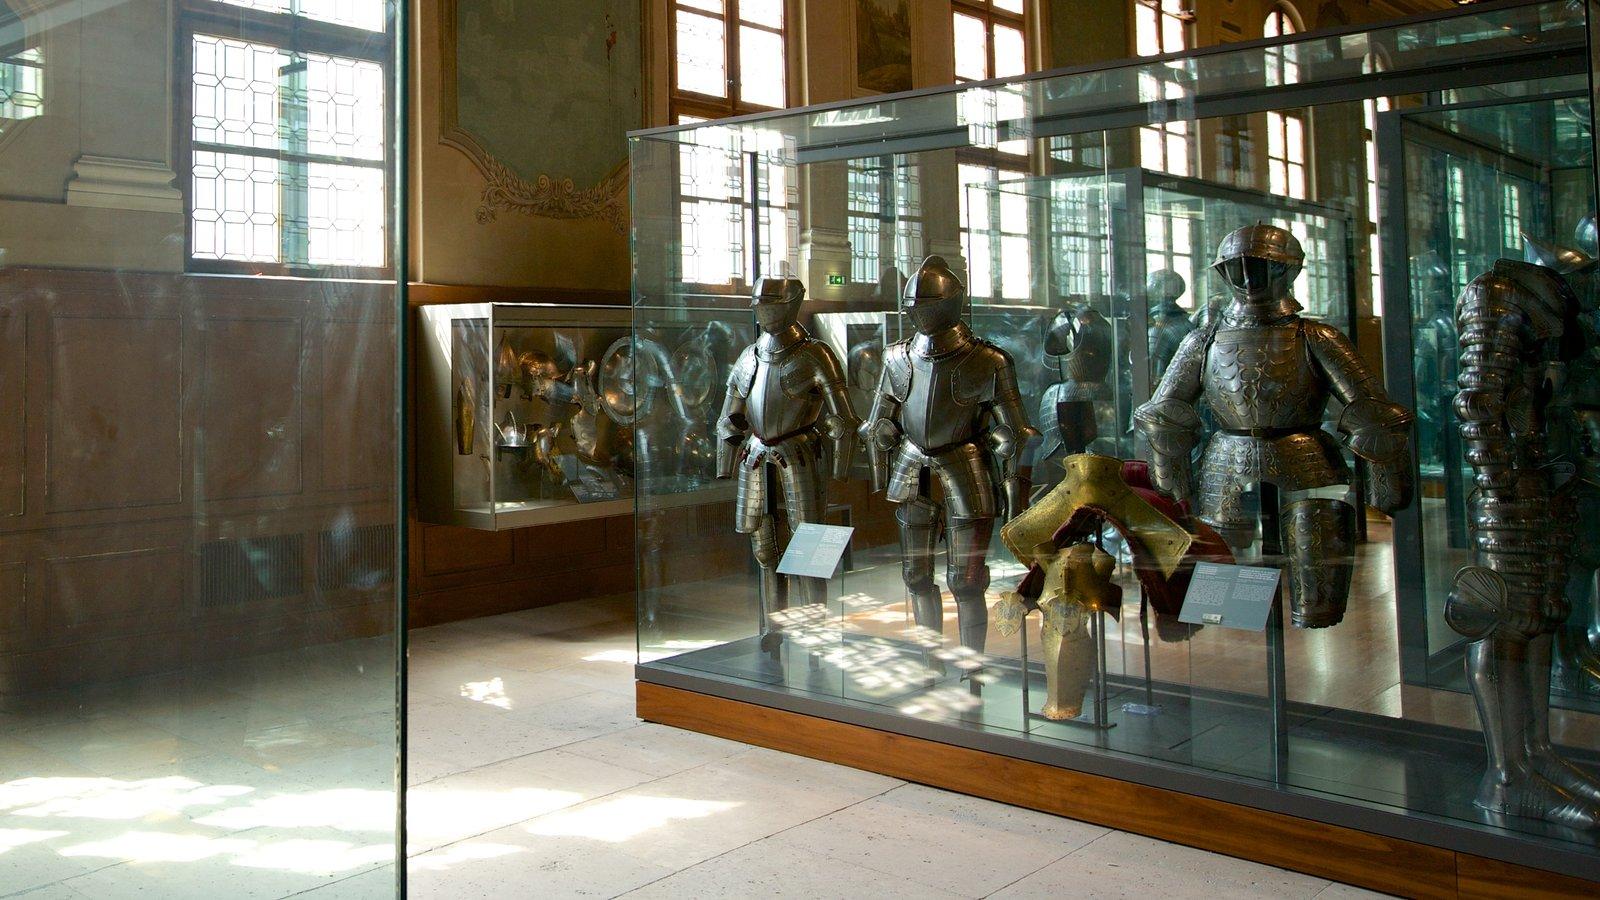 Les Invalides showing interior views